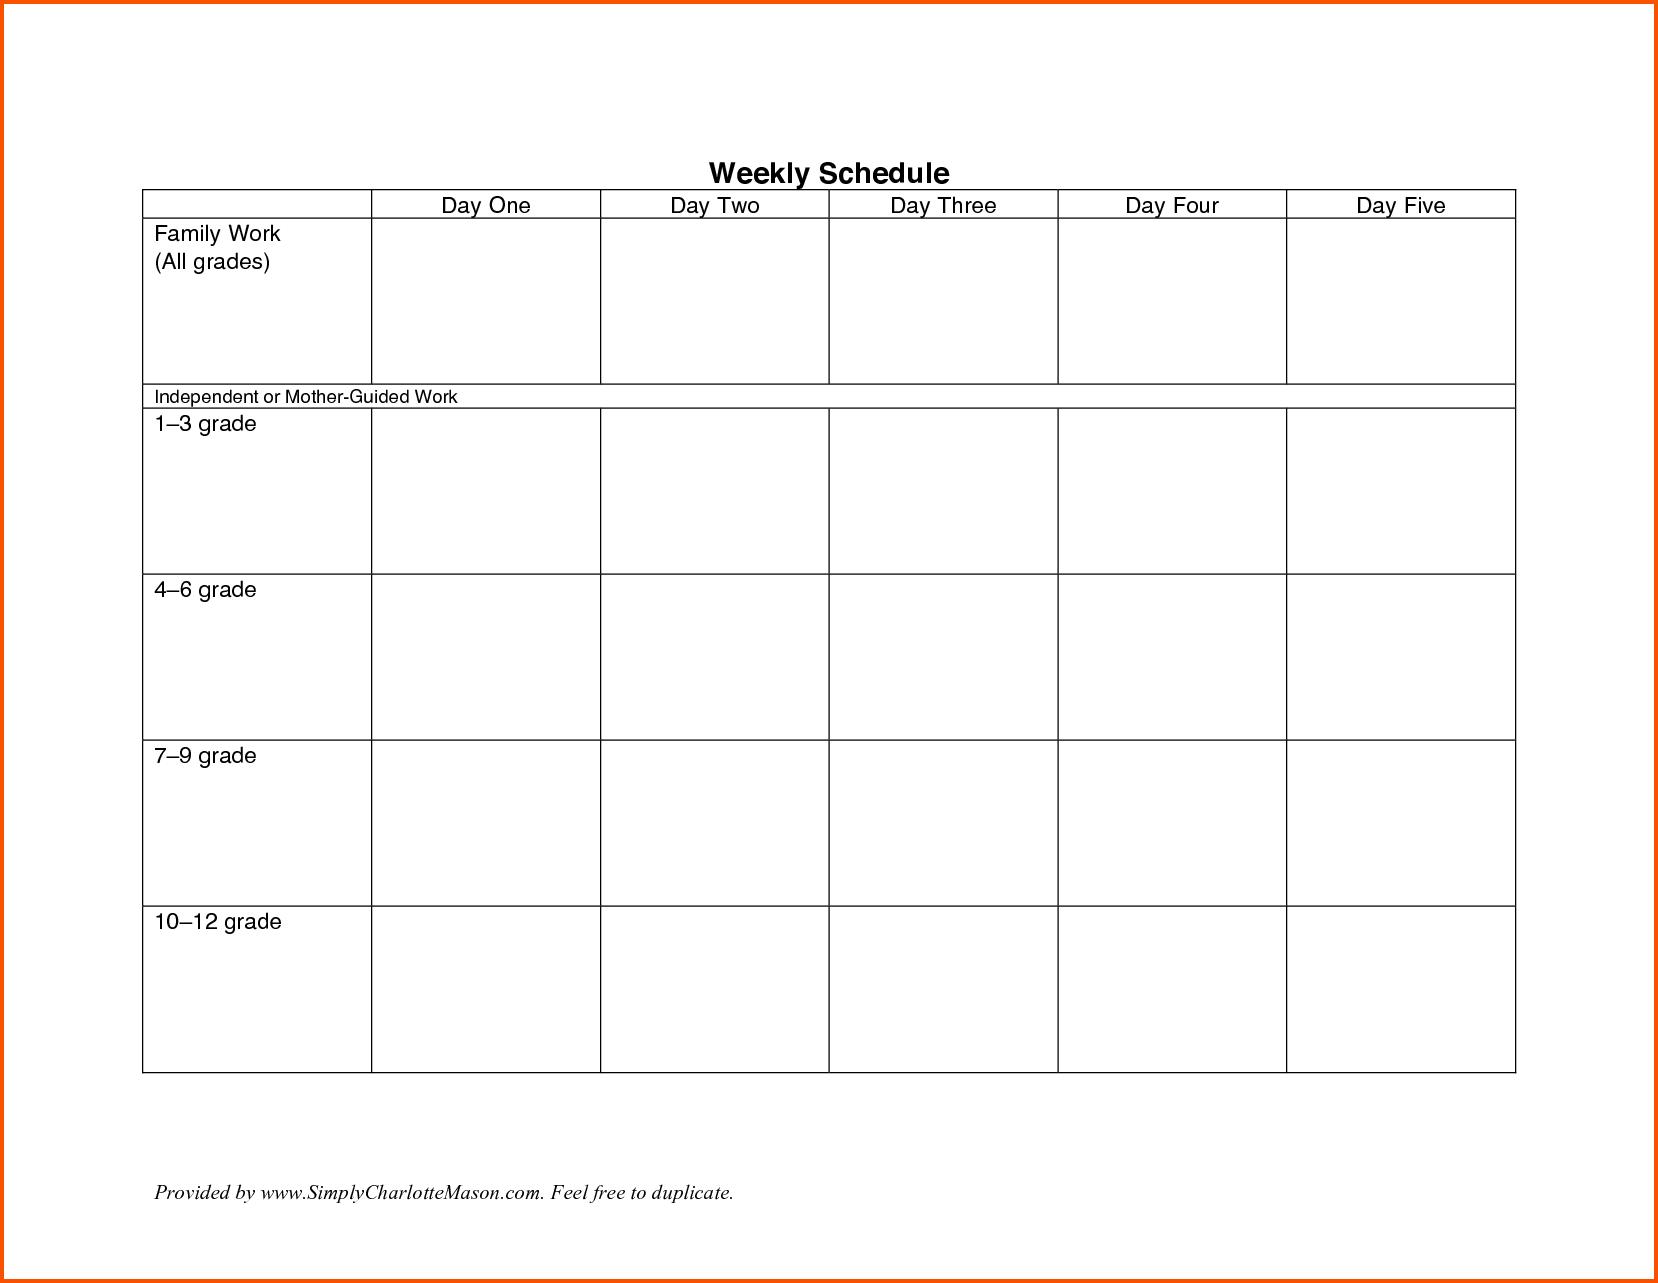 14 Free Weekly Schedule Template Survey Template Words Schedule Template Cleaning Schedule Templates Weekly Schedule [ 1283 x 1658 Pixel ]